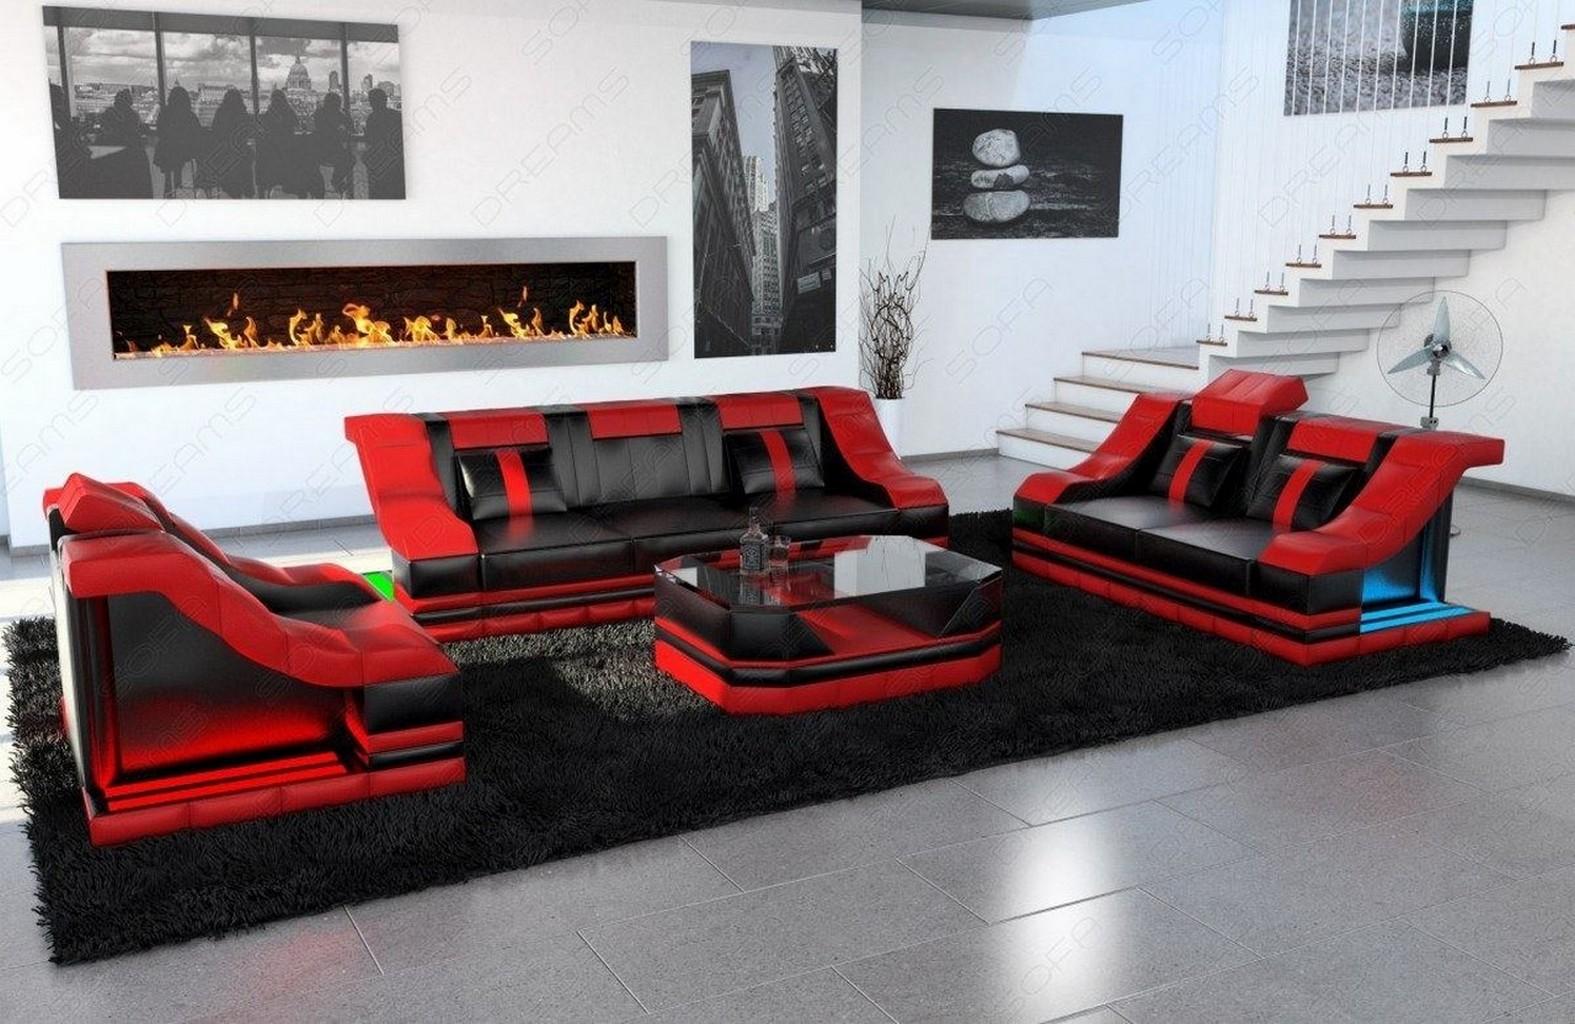 Couchgarnitur design sofagarnitur turino 3 2 1 led for Couchgarnitur italienisches design